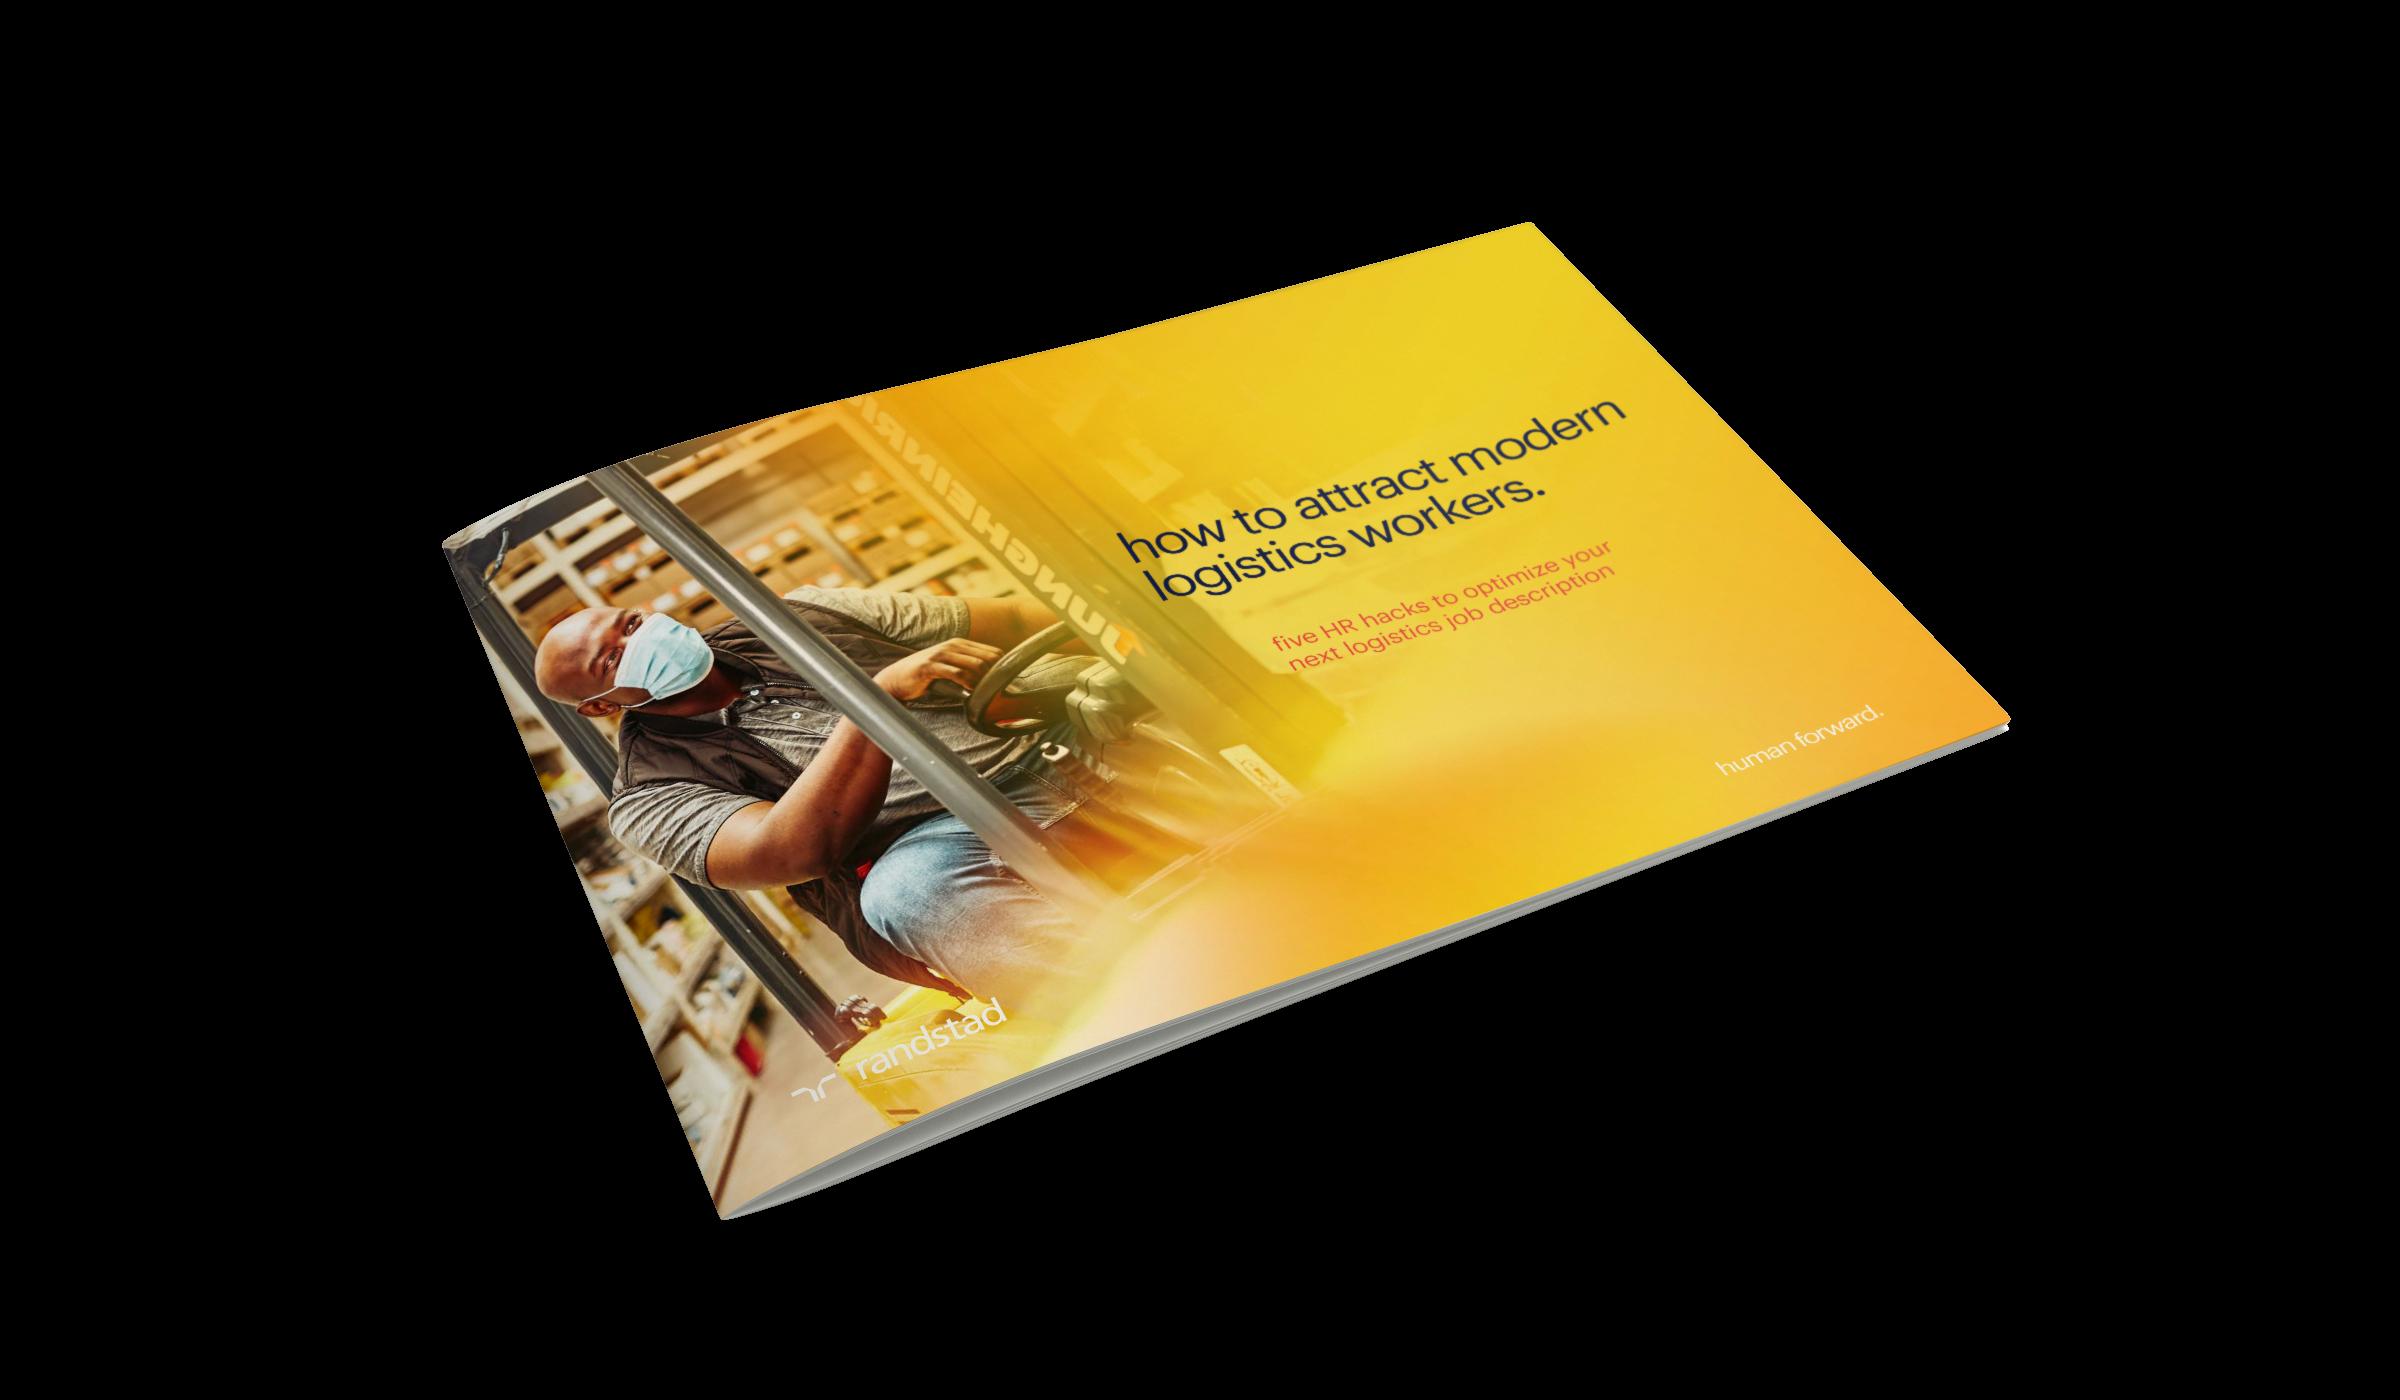 SME-CJ4-visual-A guide to writing successful job descriptions for modern logistics roles 201201